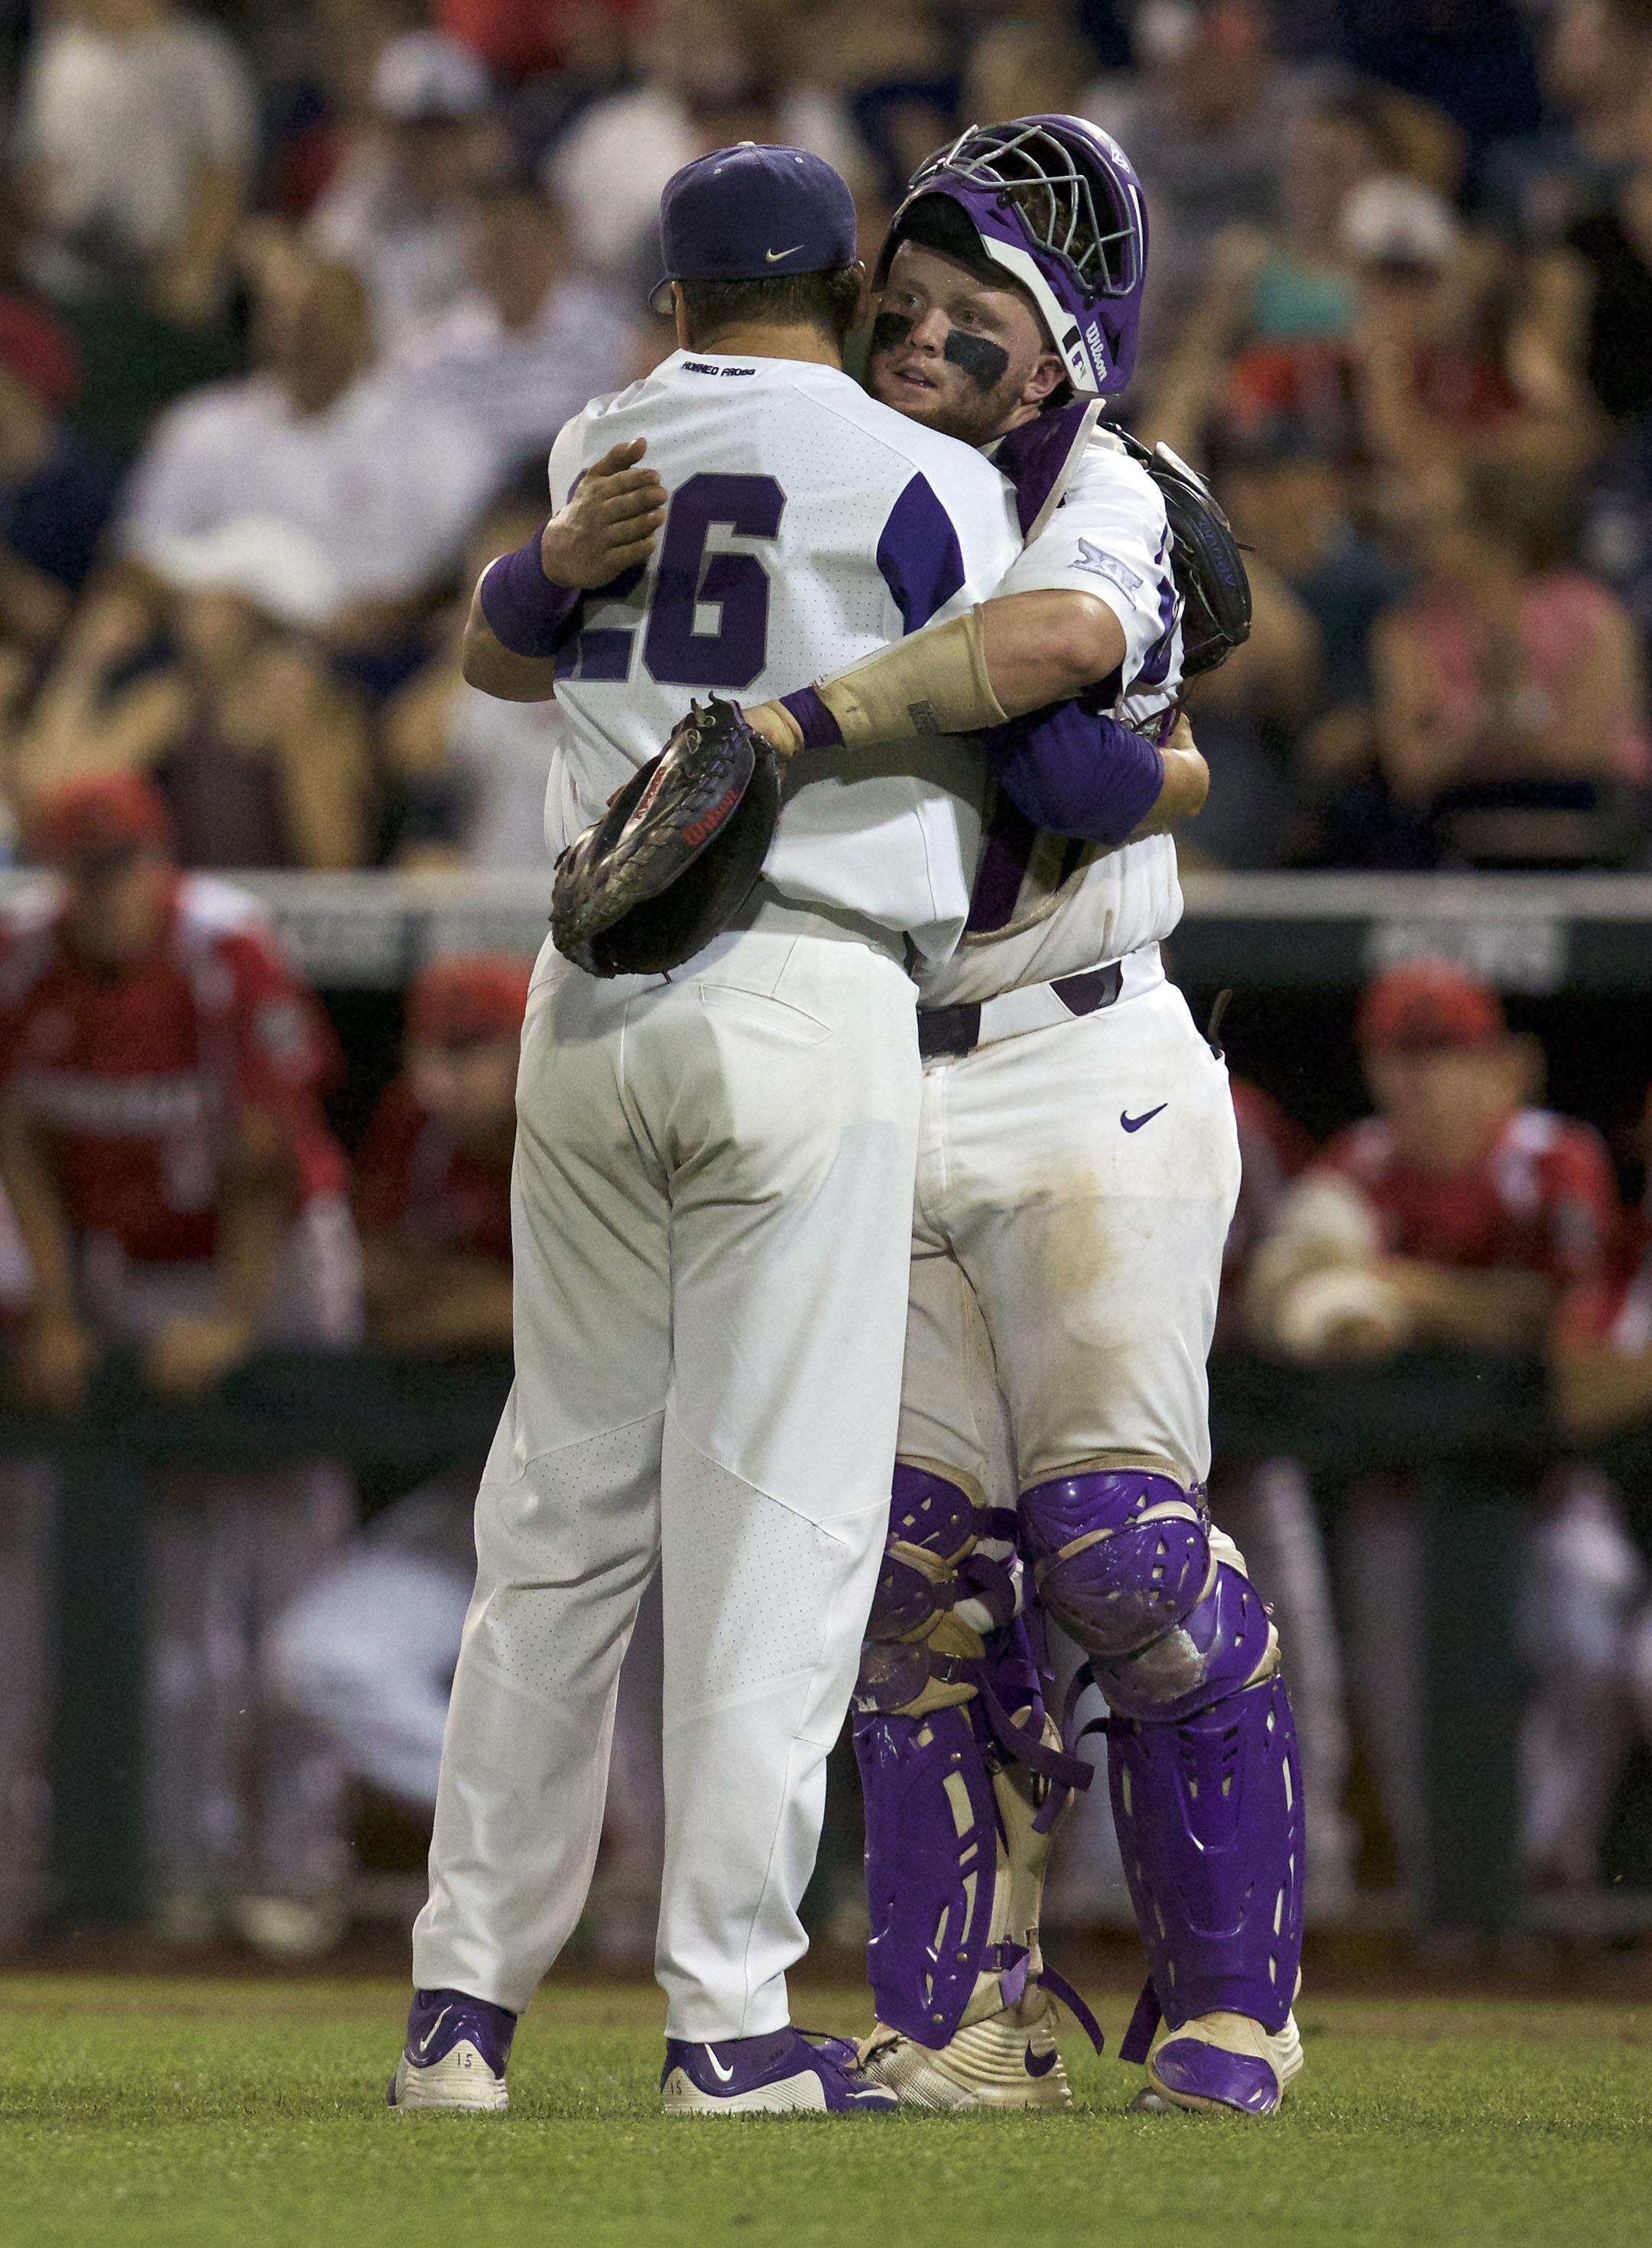 NCAA Baseball: College World Series-Louisville vs TCU